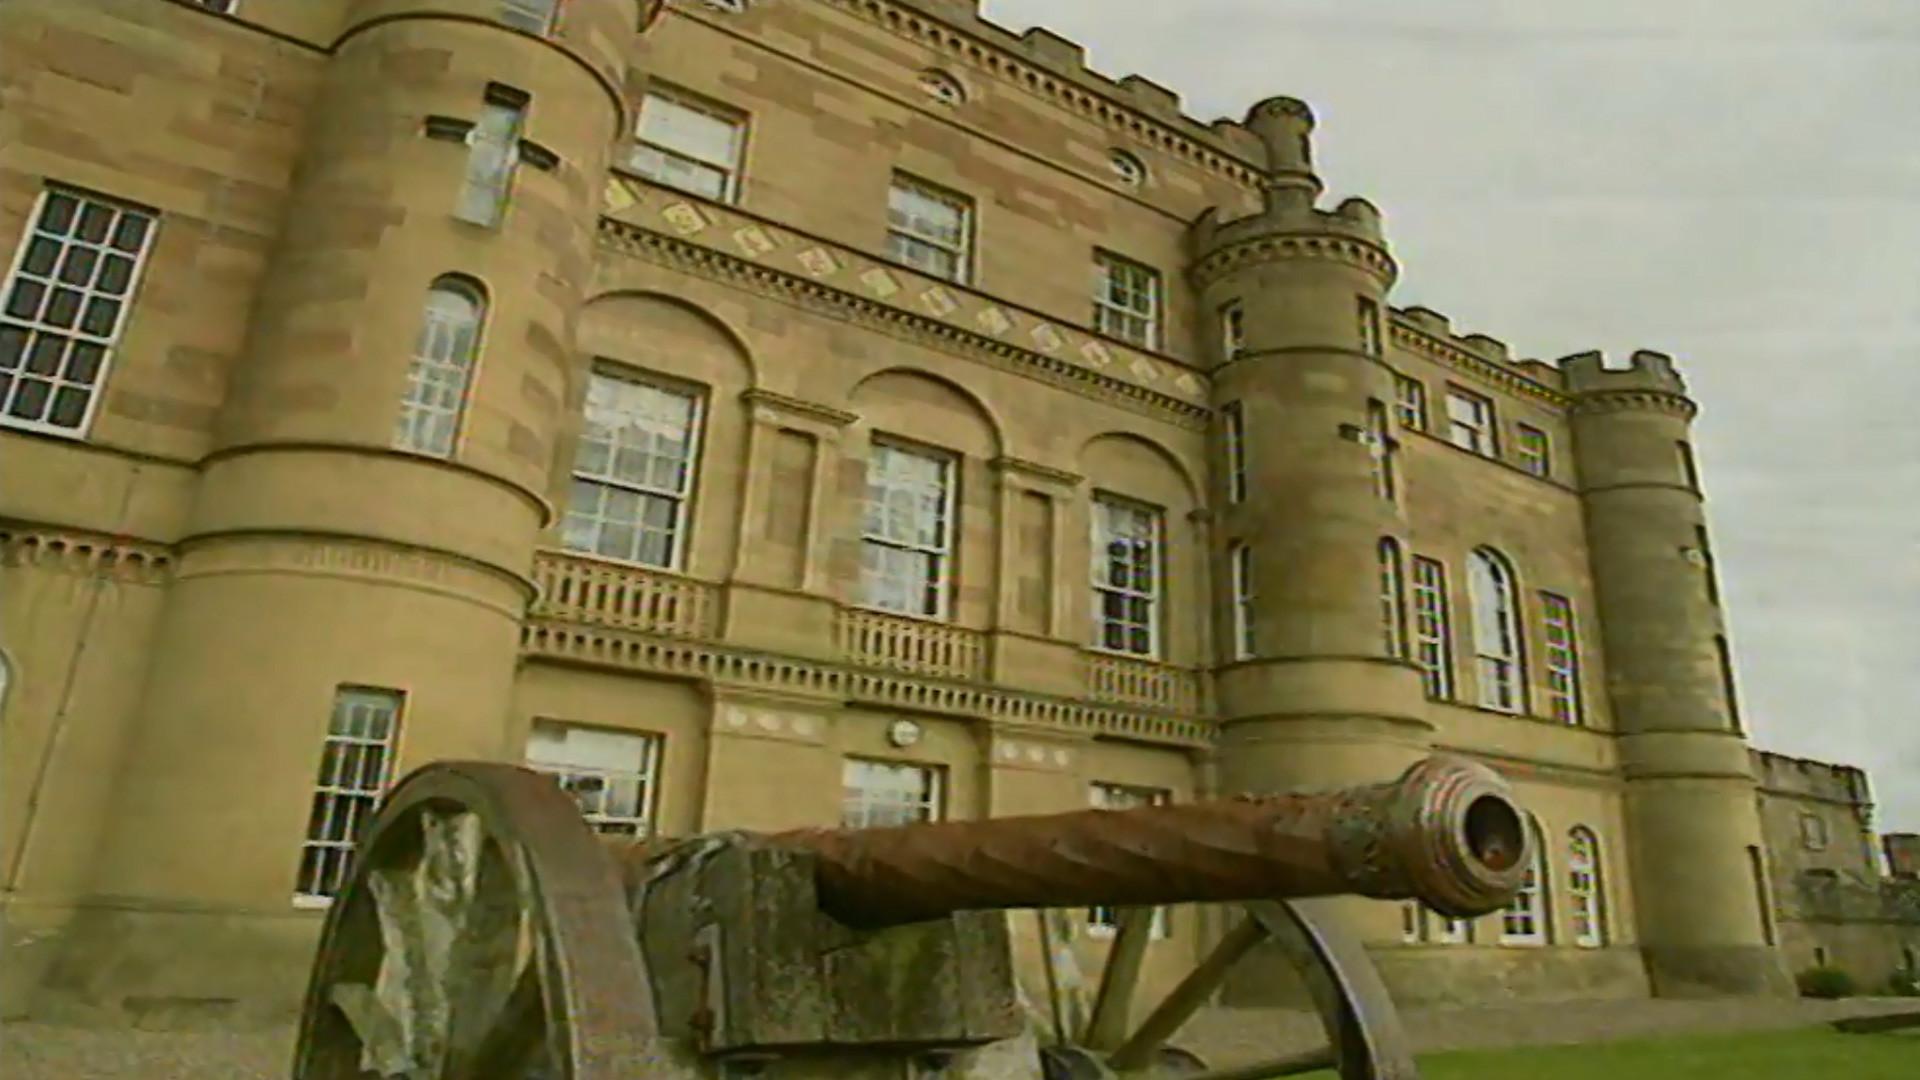 Castles of Scotland